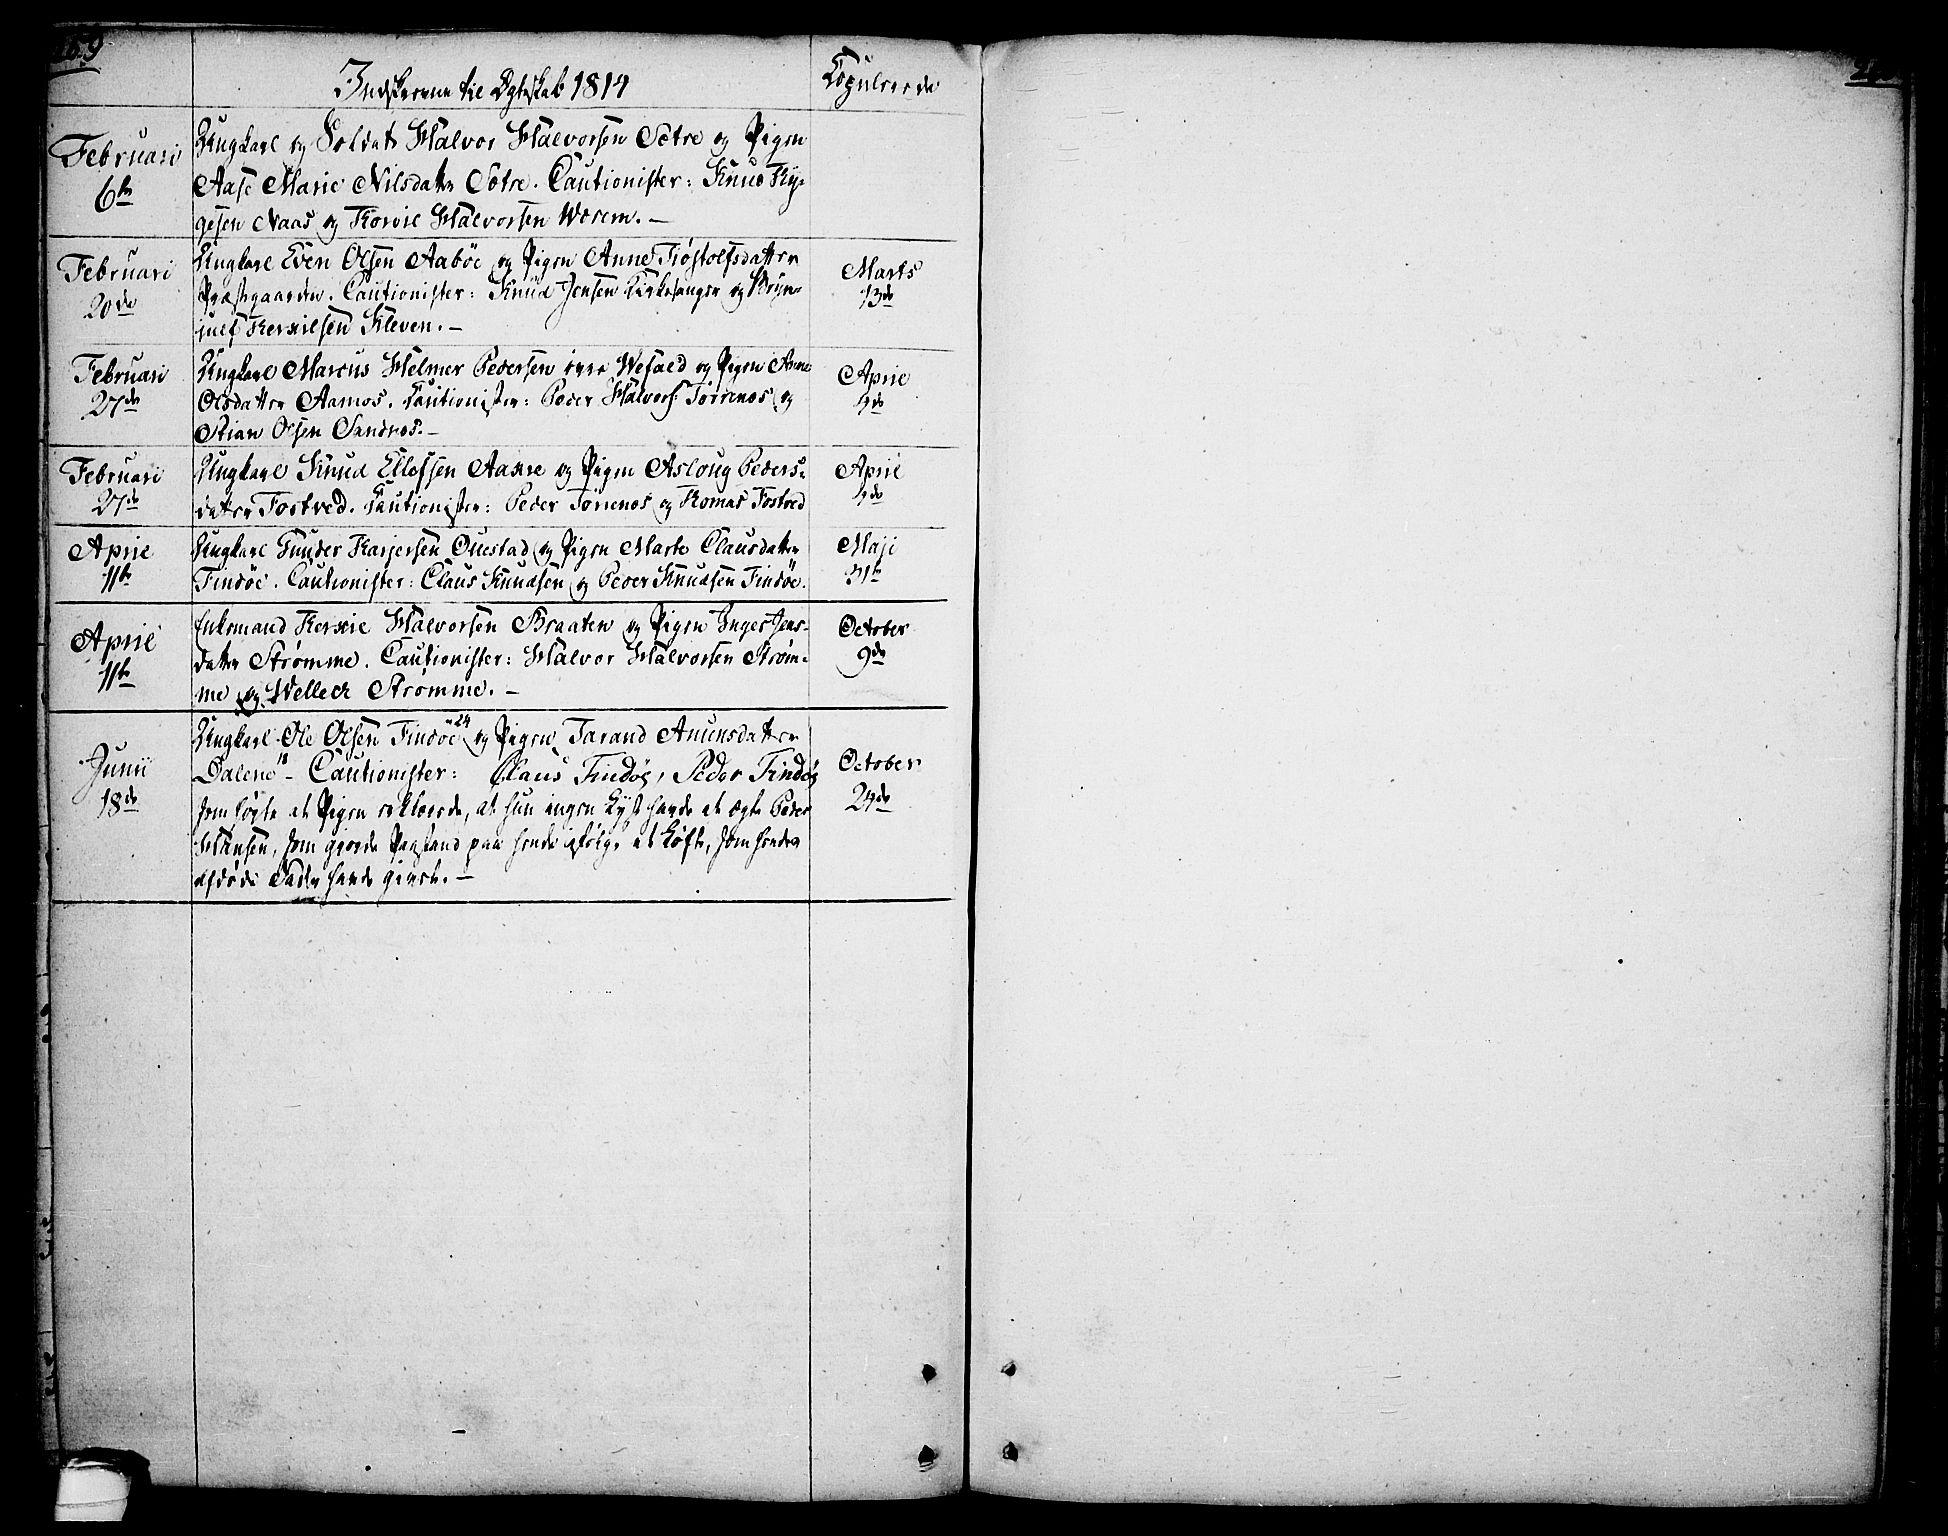 SAKO, Drangedal kirkebøker, F/Fa/L0003: Ministerialbok nr. 3, 1768-1814, s. 259-260